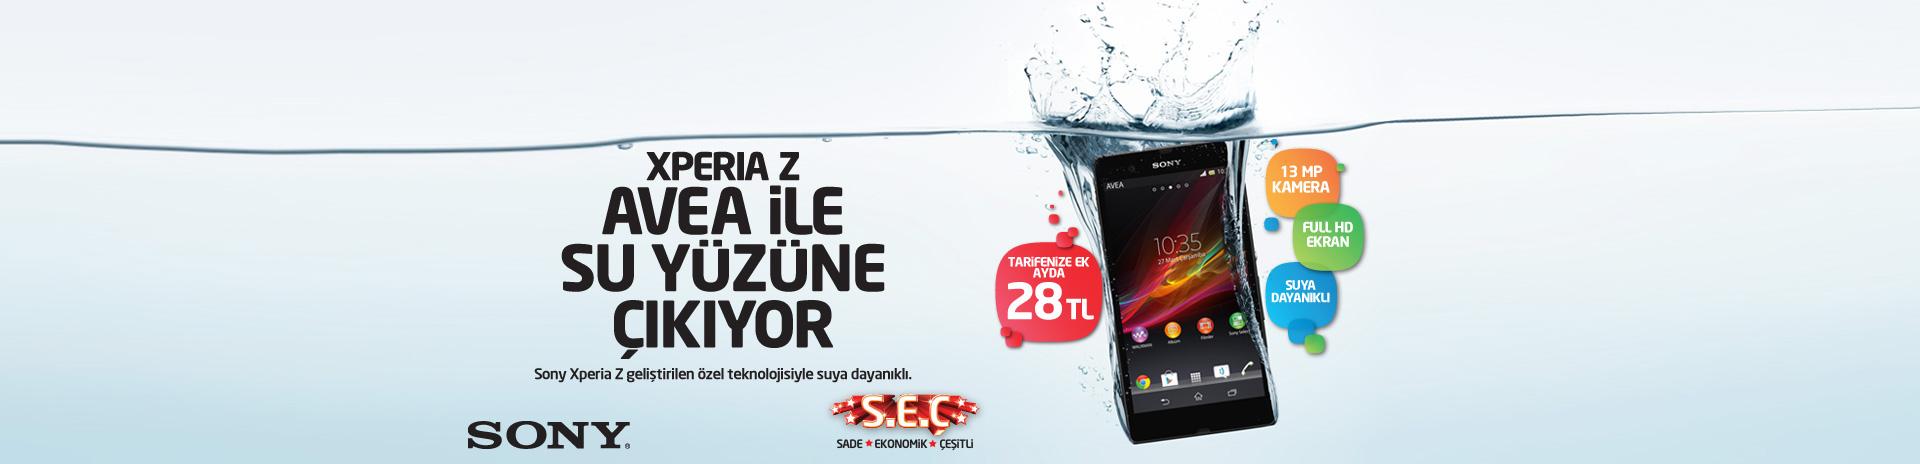 Sony-Xperia-Z-Avea